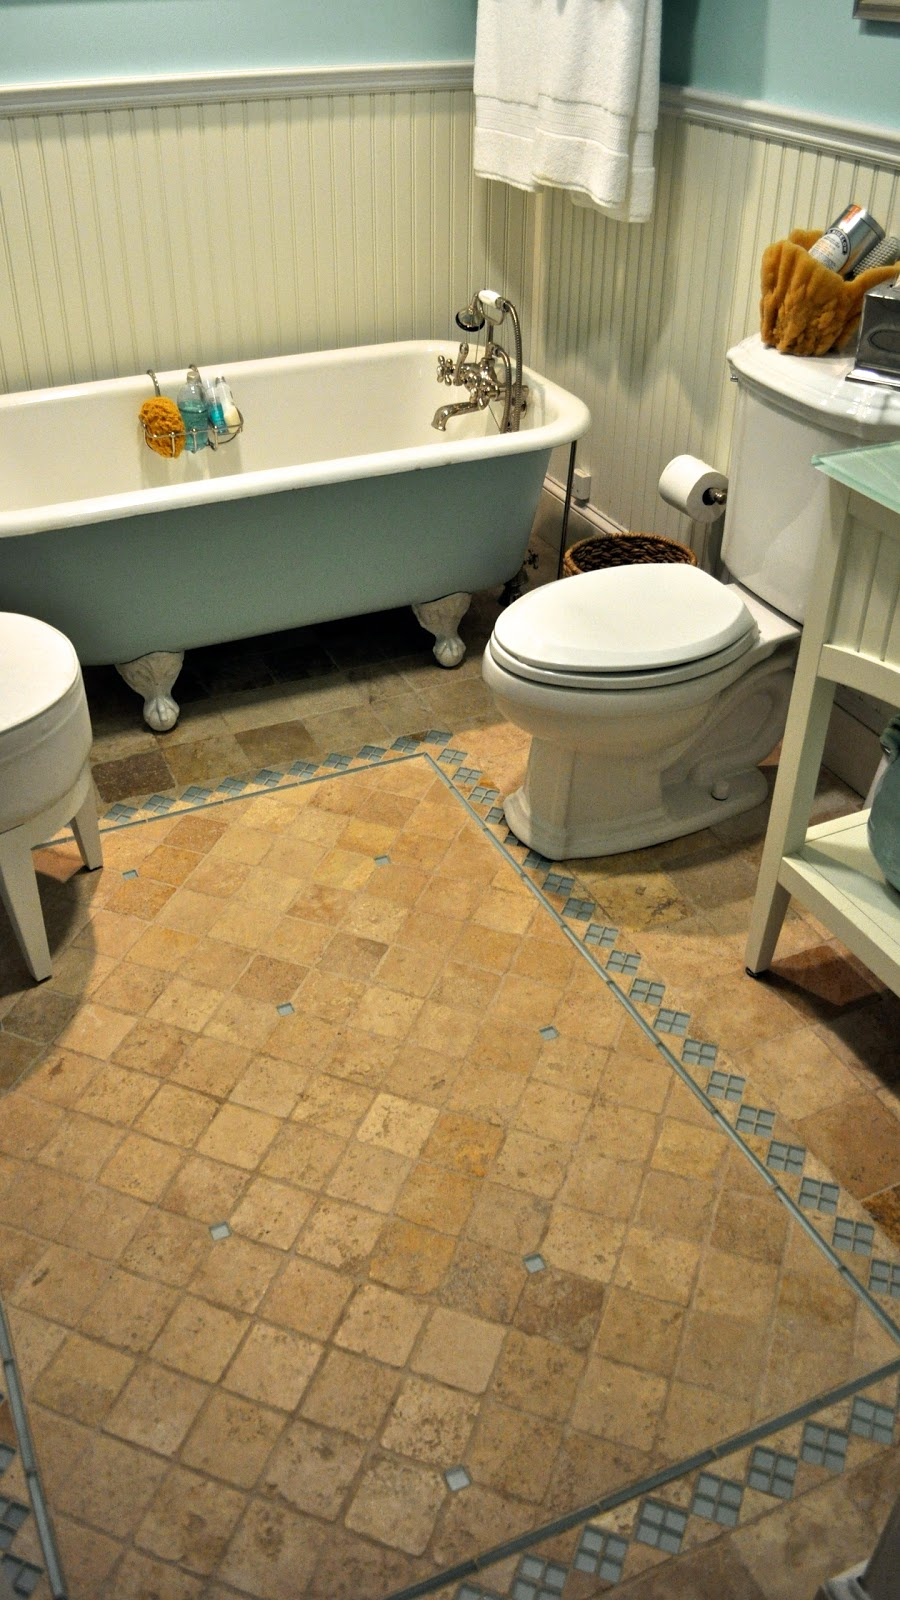 Cottage Style Bathroom Floor Tile : Sopo cottage tile style creating rug borders